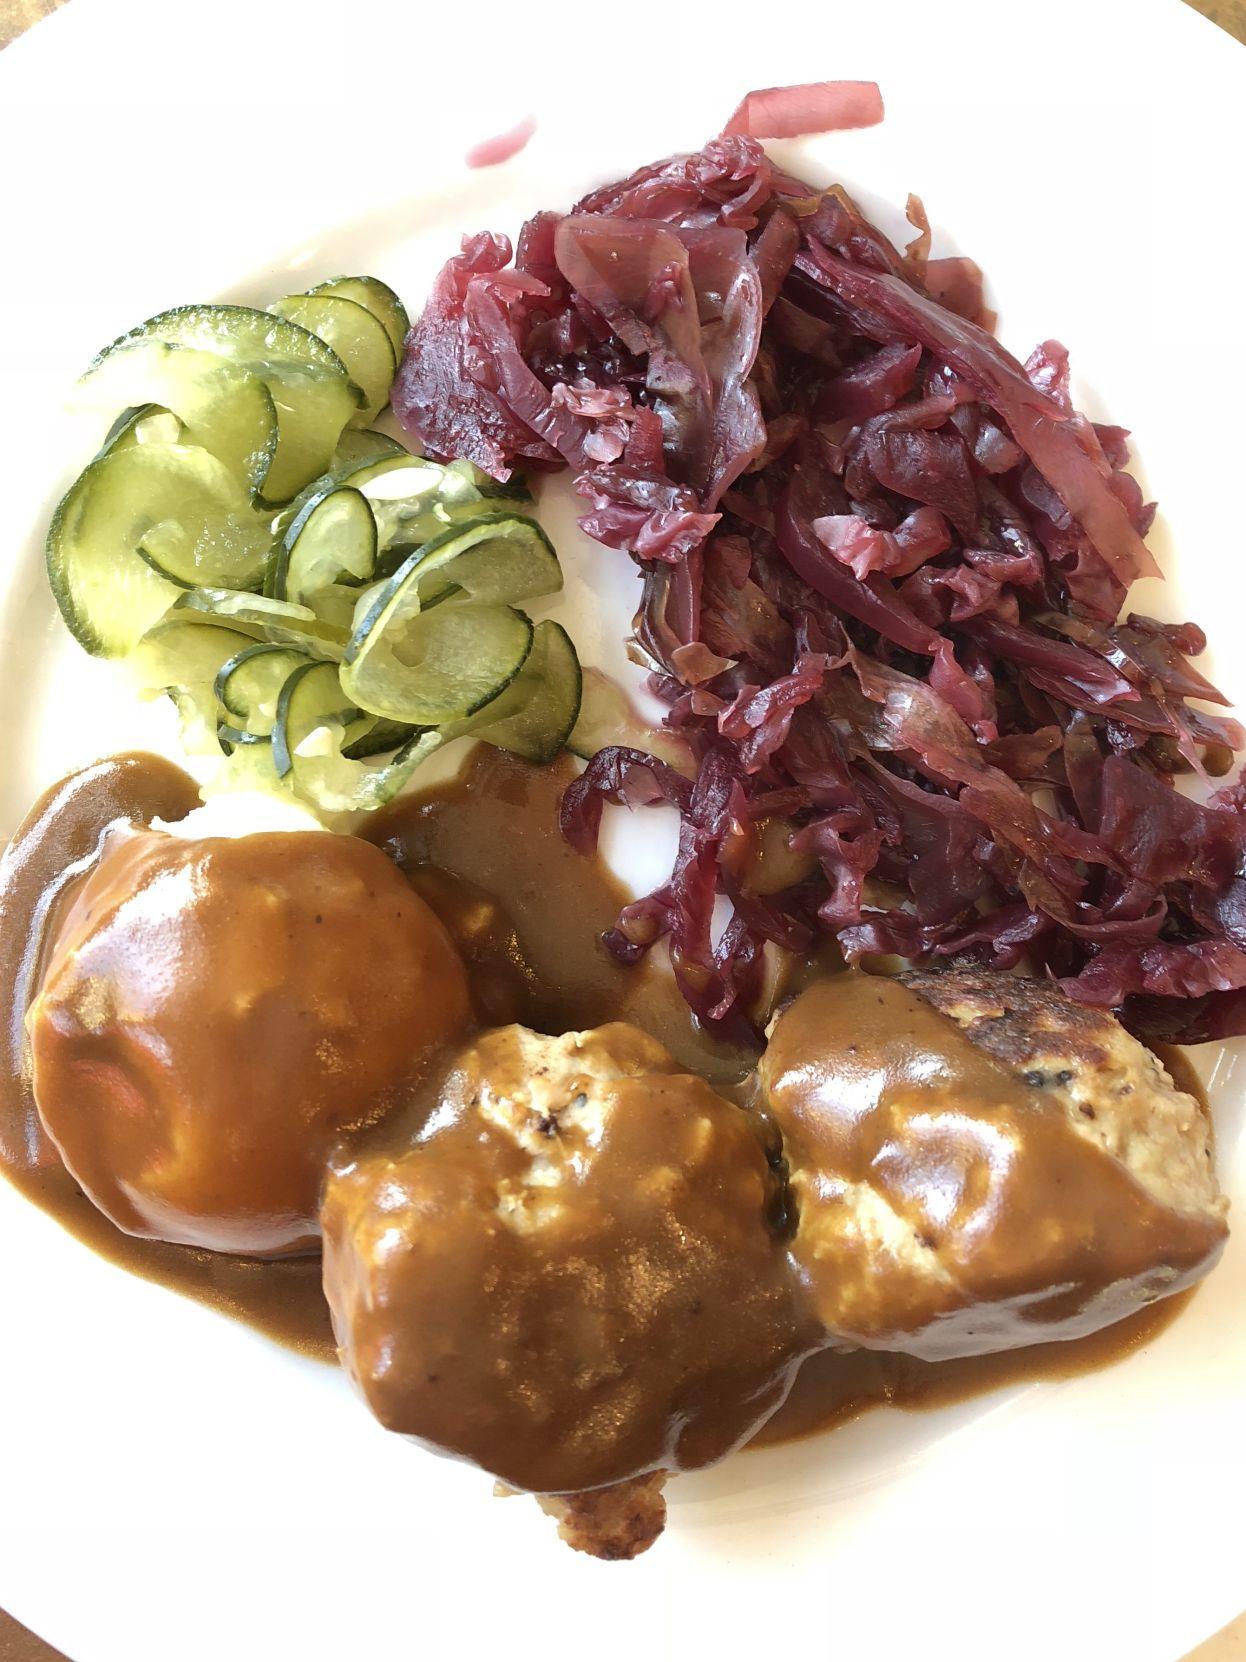 010119 Solvang Food Tour 7